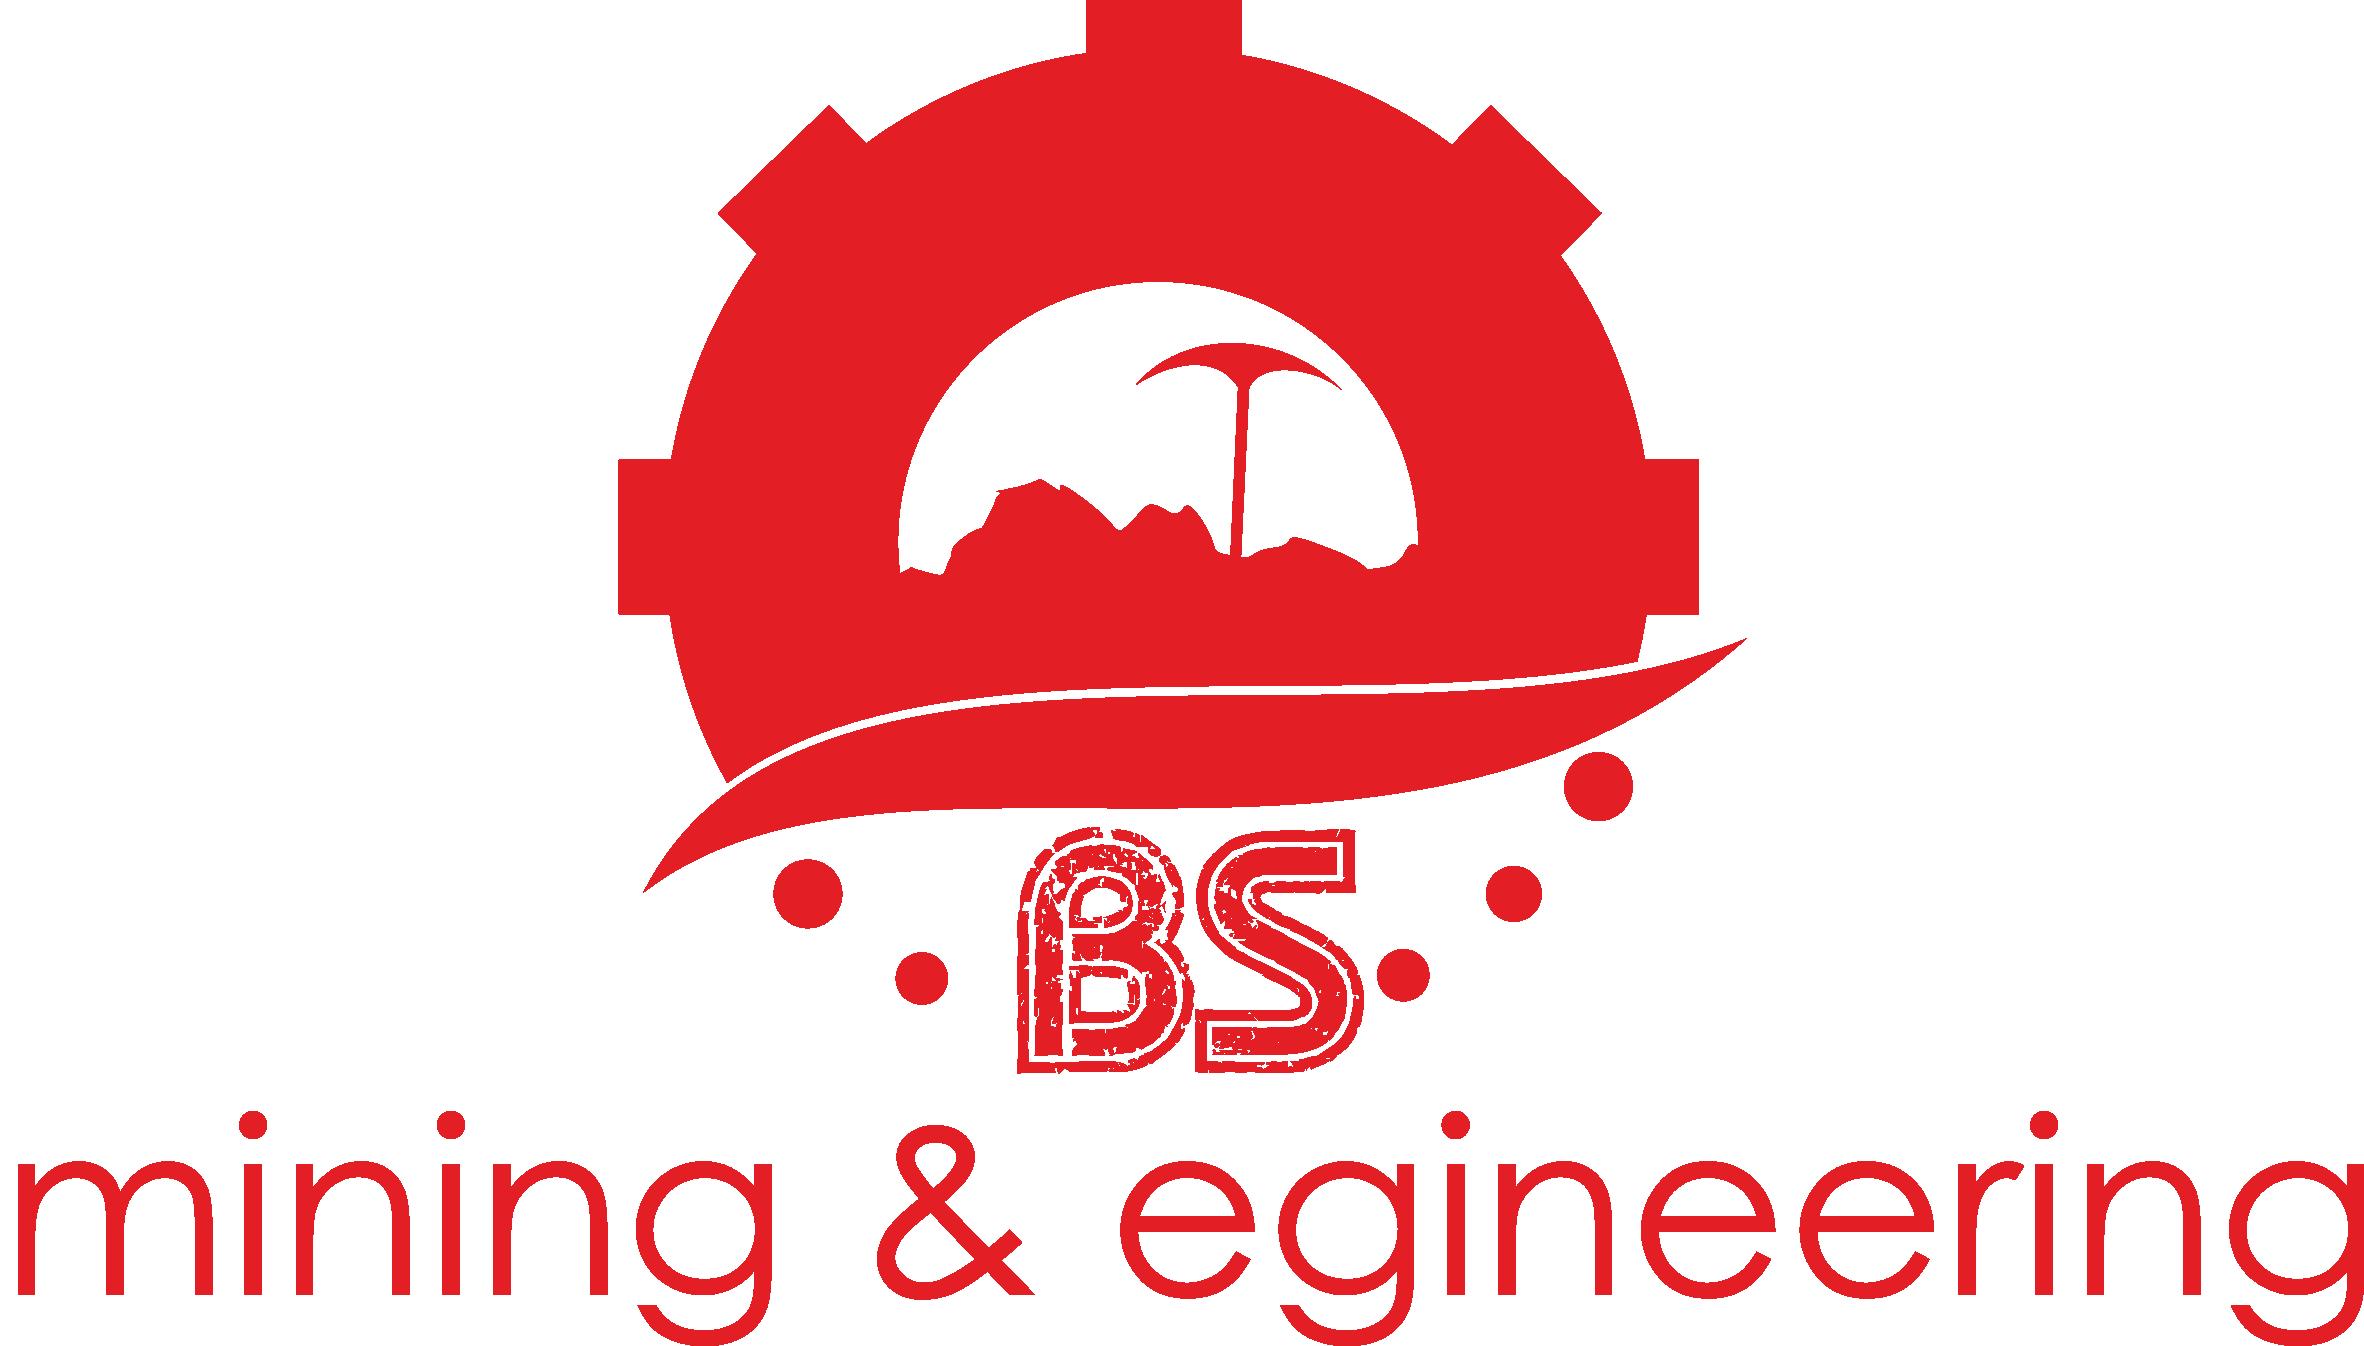 A Level 1 BBBEE Company